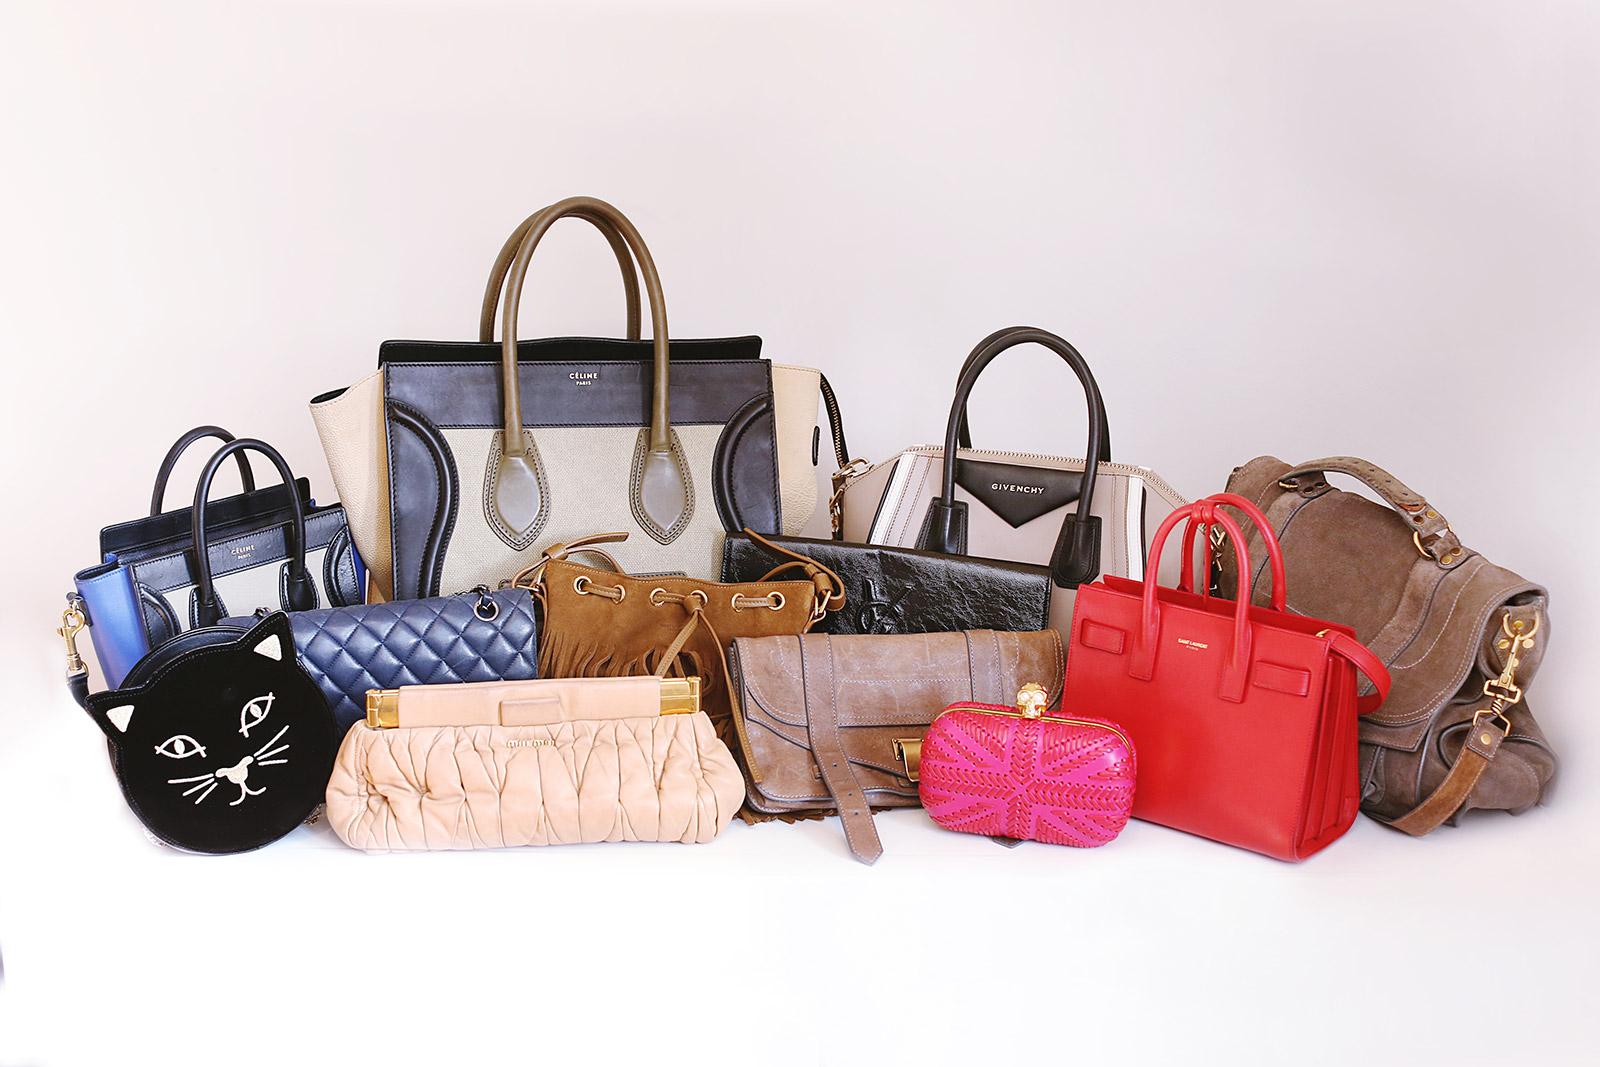 My Designer Bag Collection Amelia Liana